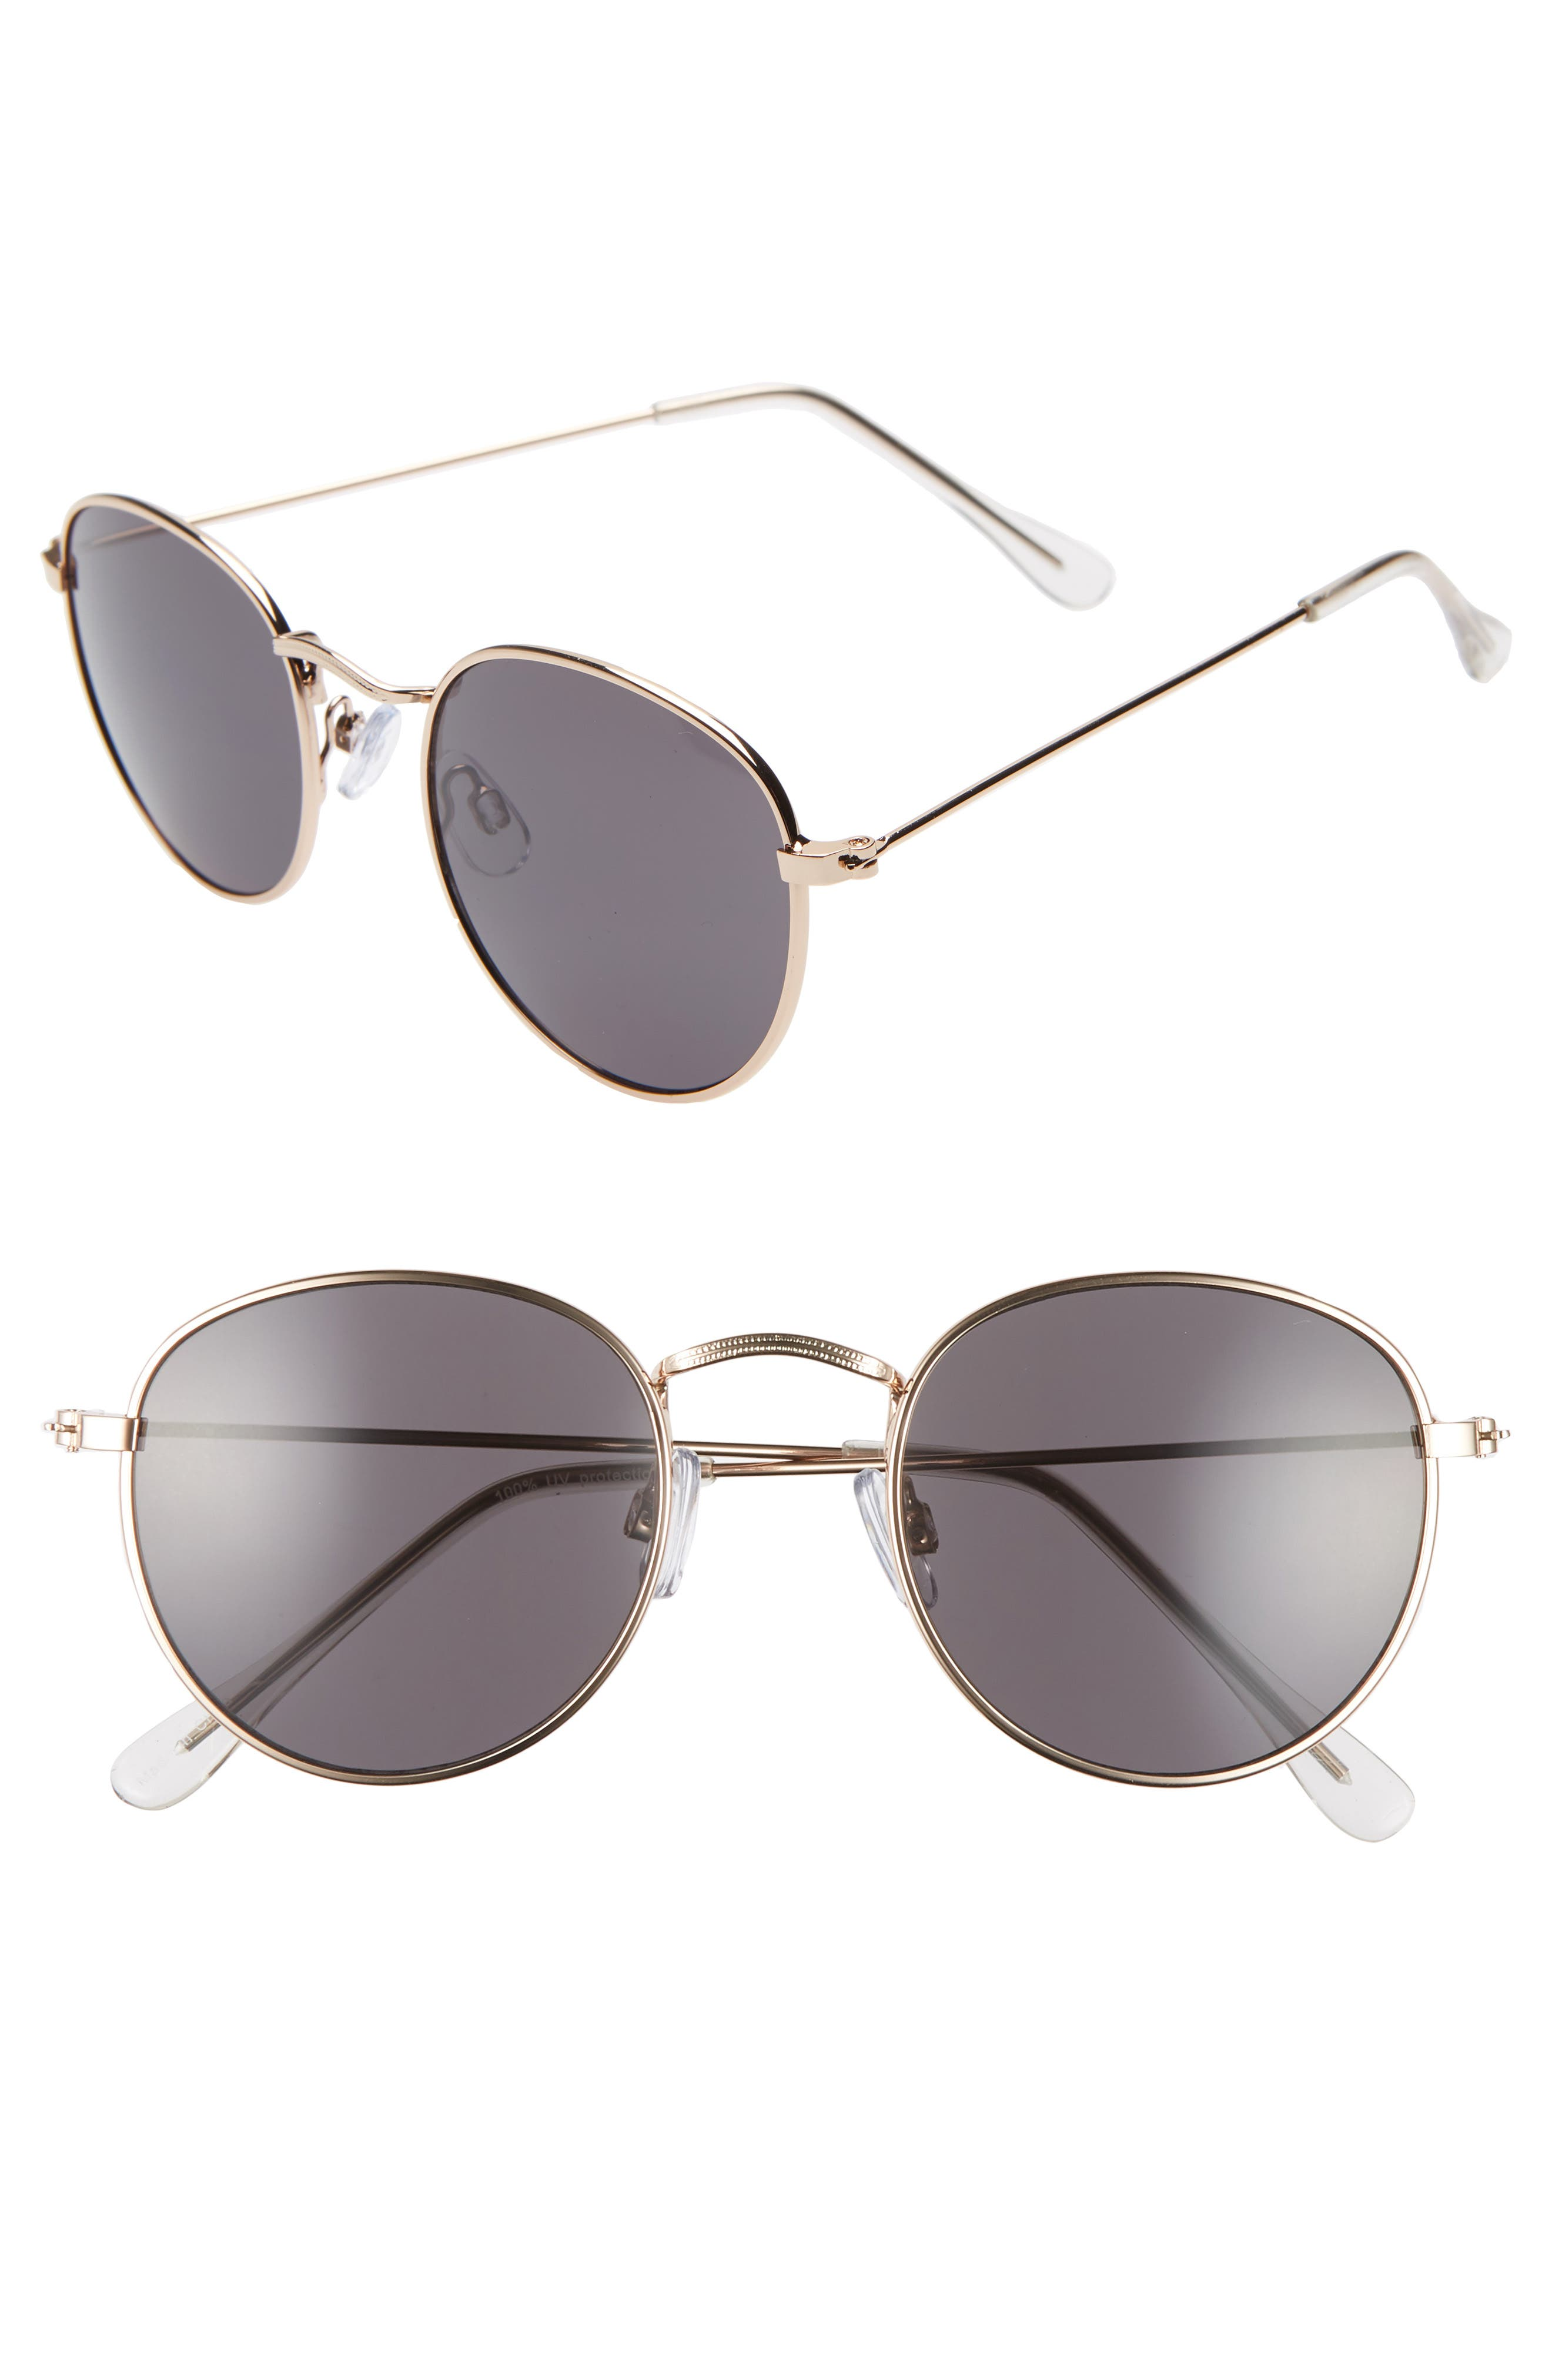 48mm Round Metal Sunglasses